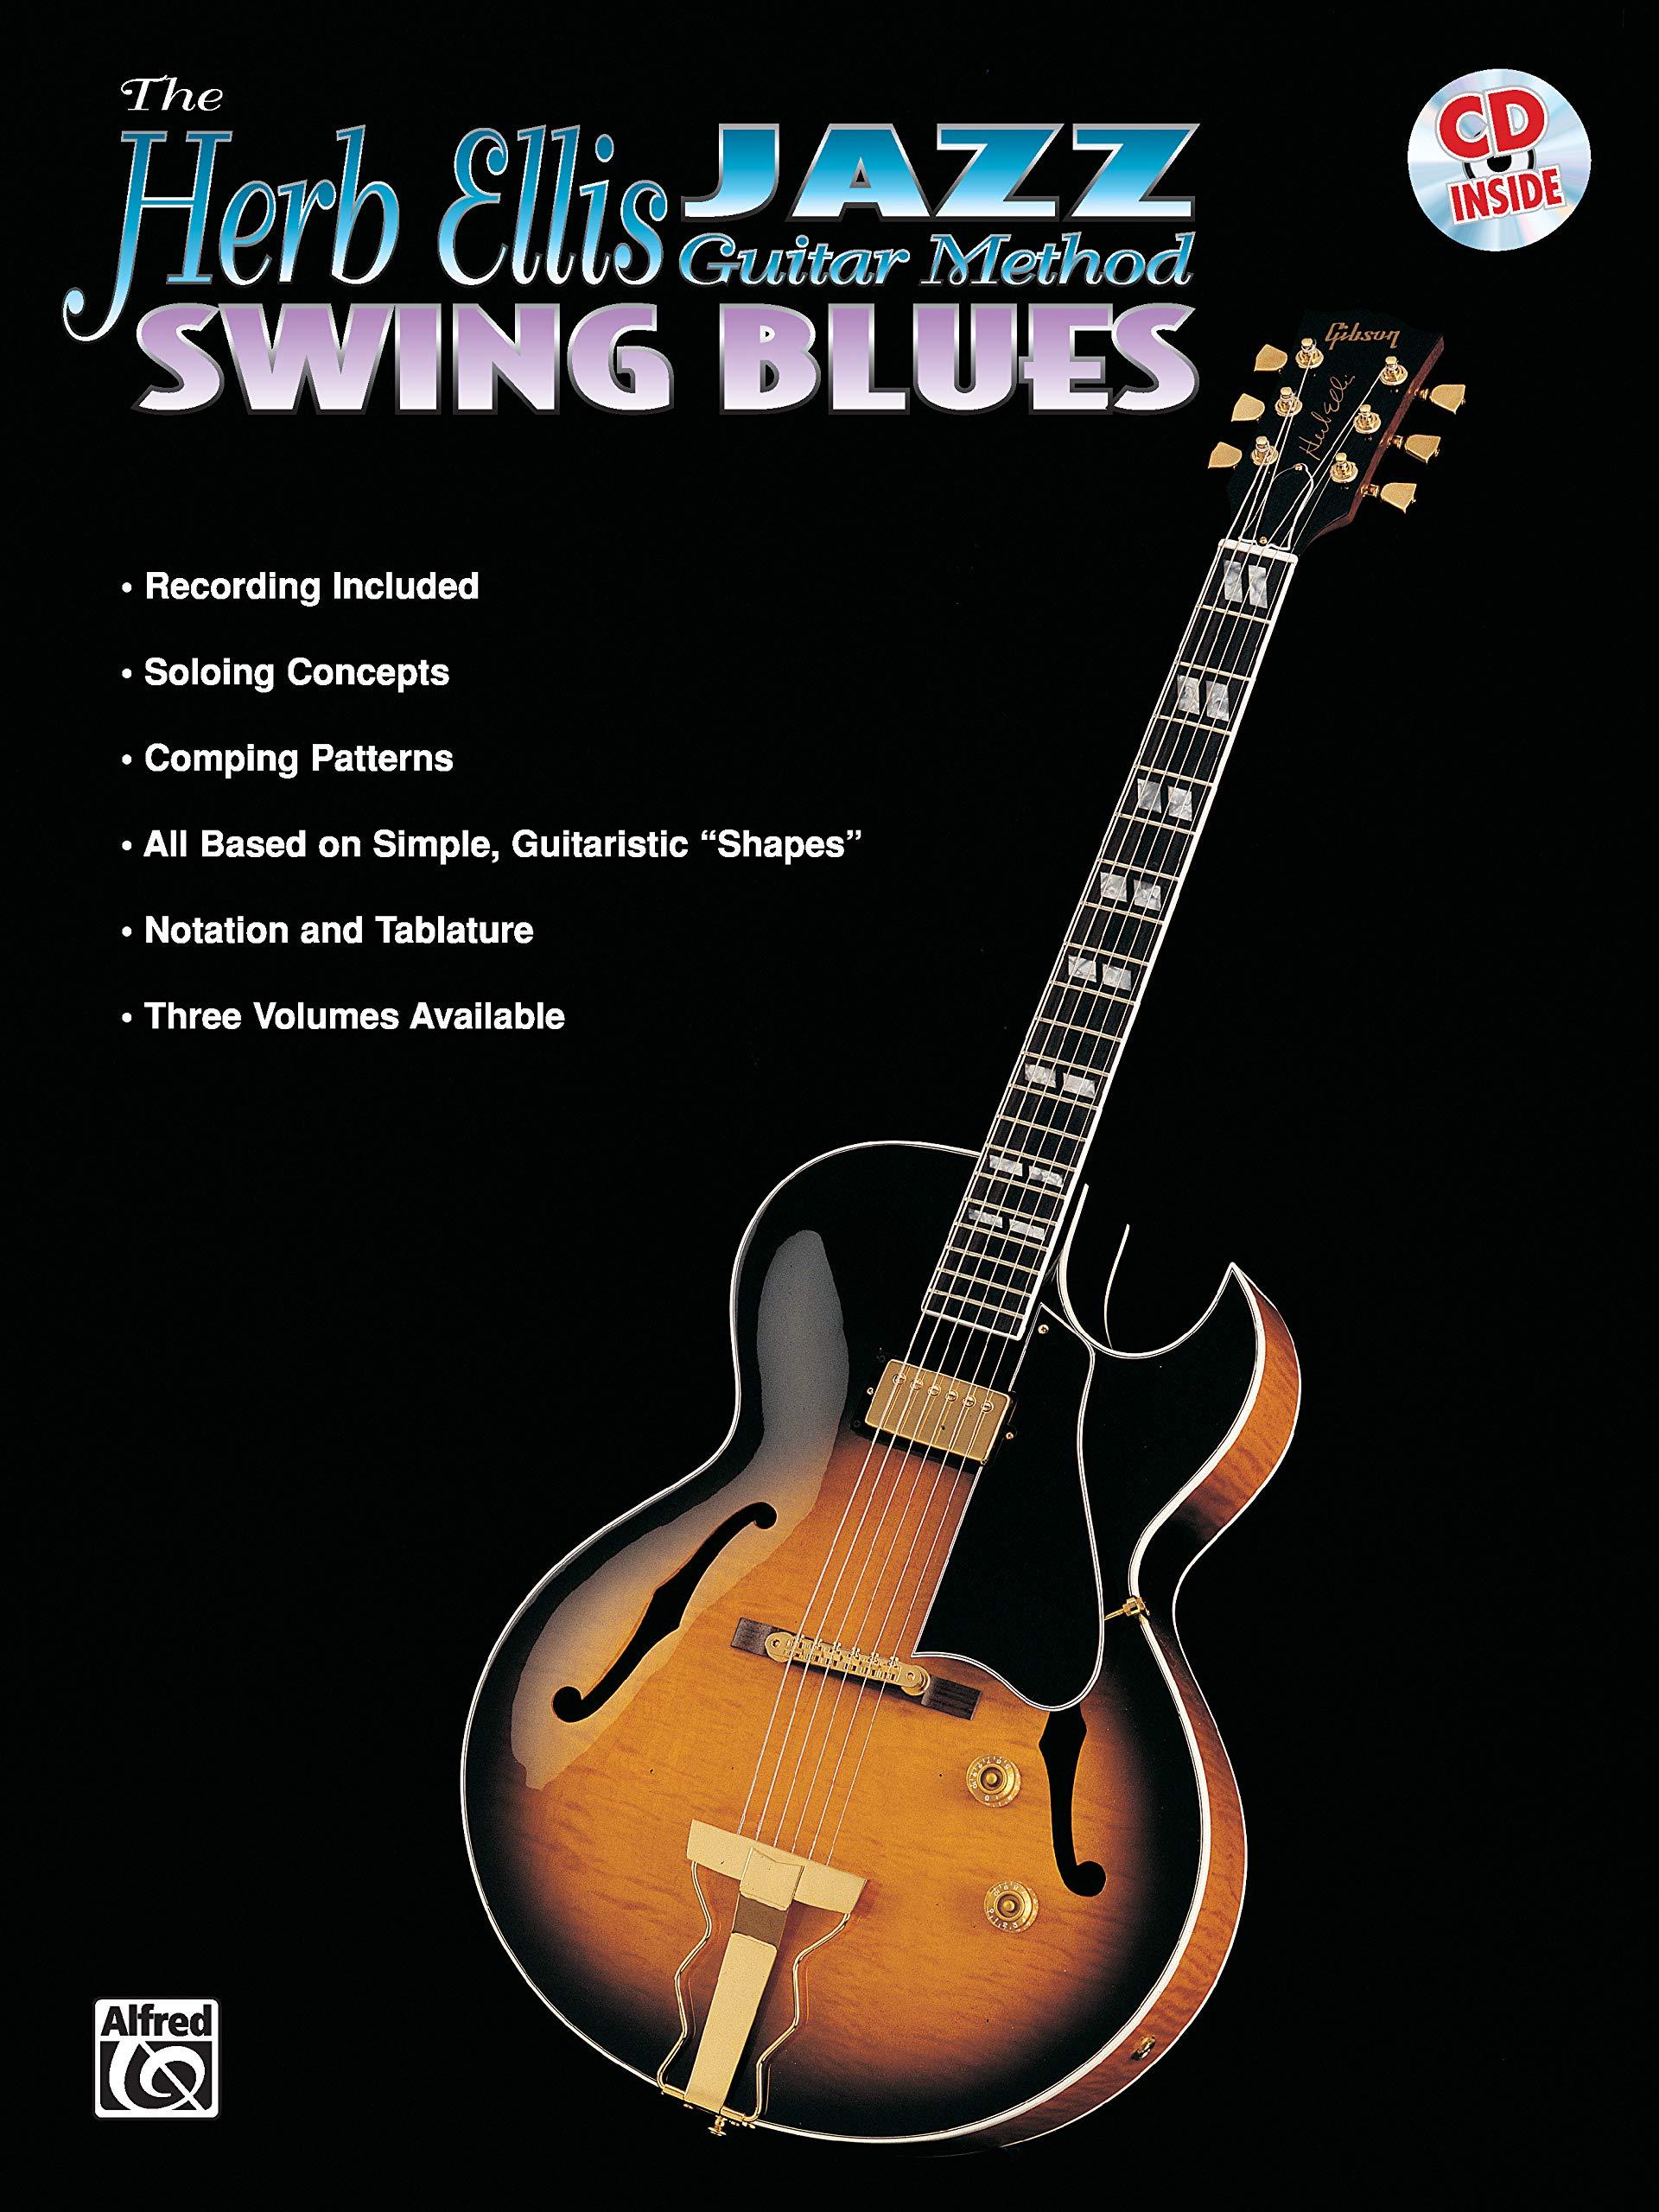 Jazz Guitar Method: Swing Blues: Amazon.es: Ellis, Herb: Libros en ...